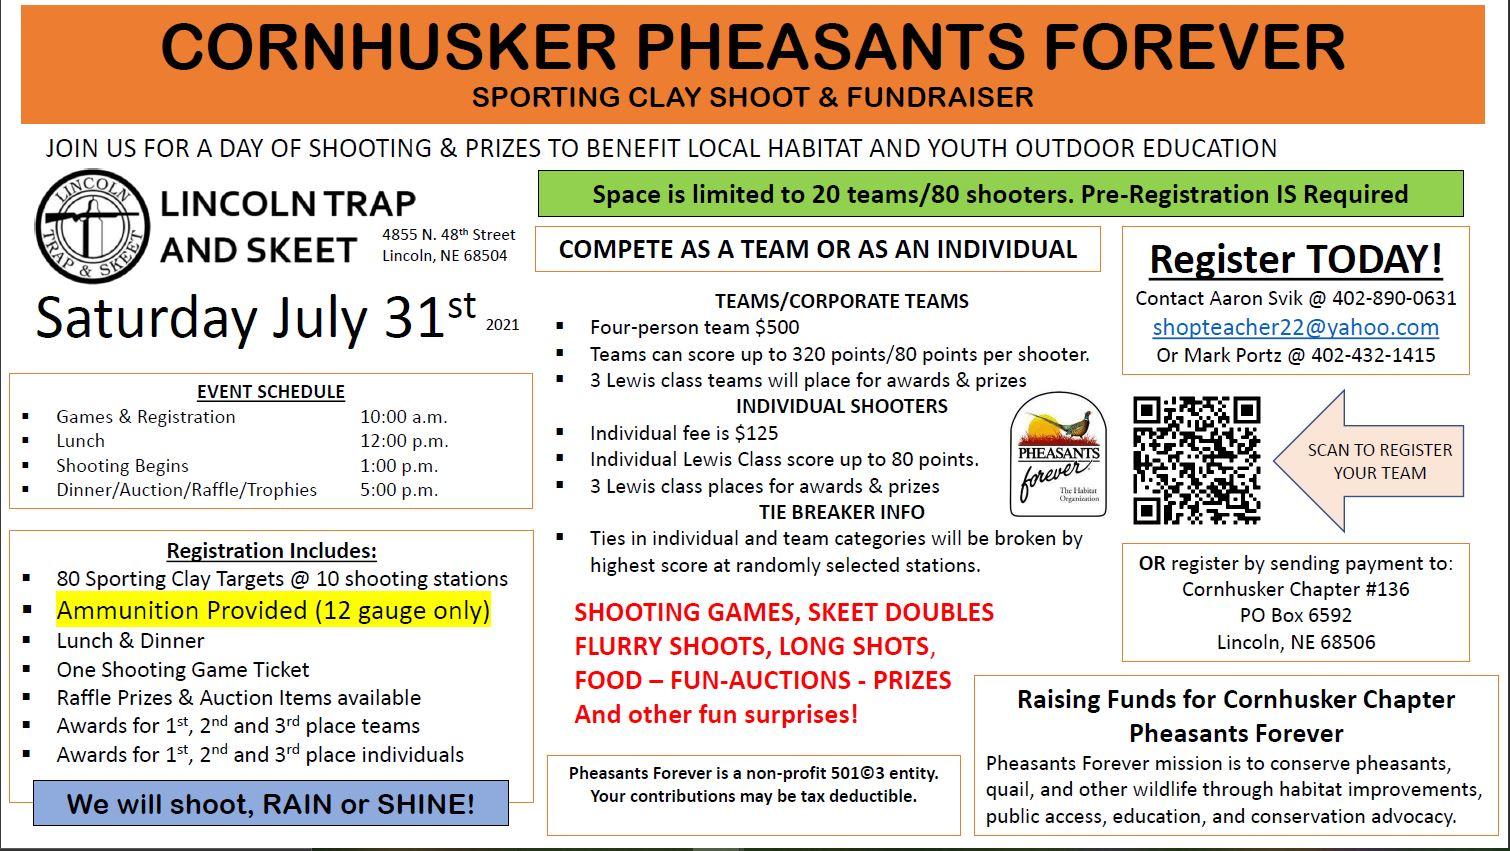 Cornhusker PF Sporting Clays Shoot & Fundraiser @ Lincoln Trap and Skeet | Lincoln | Nebraska | United States